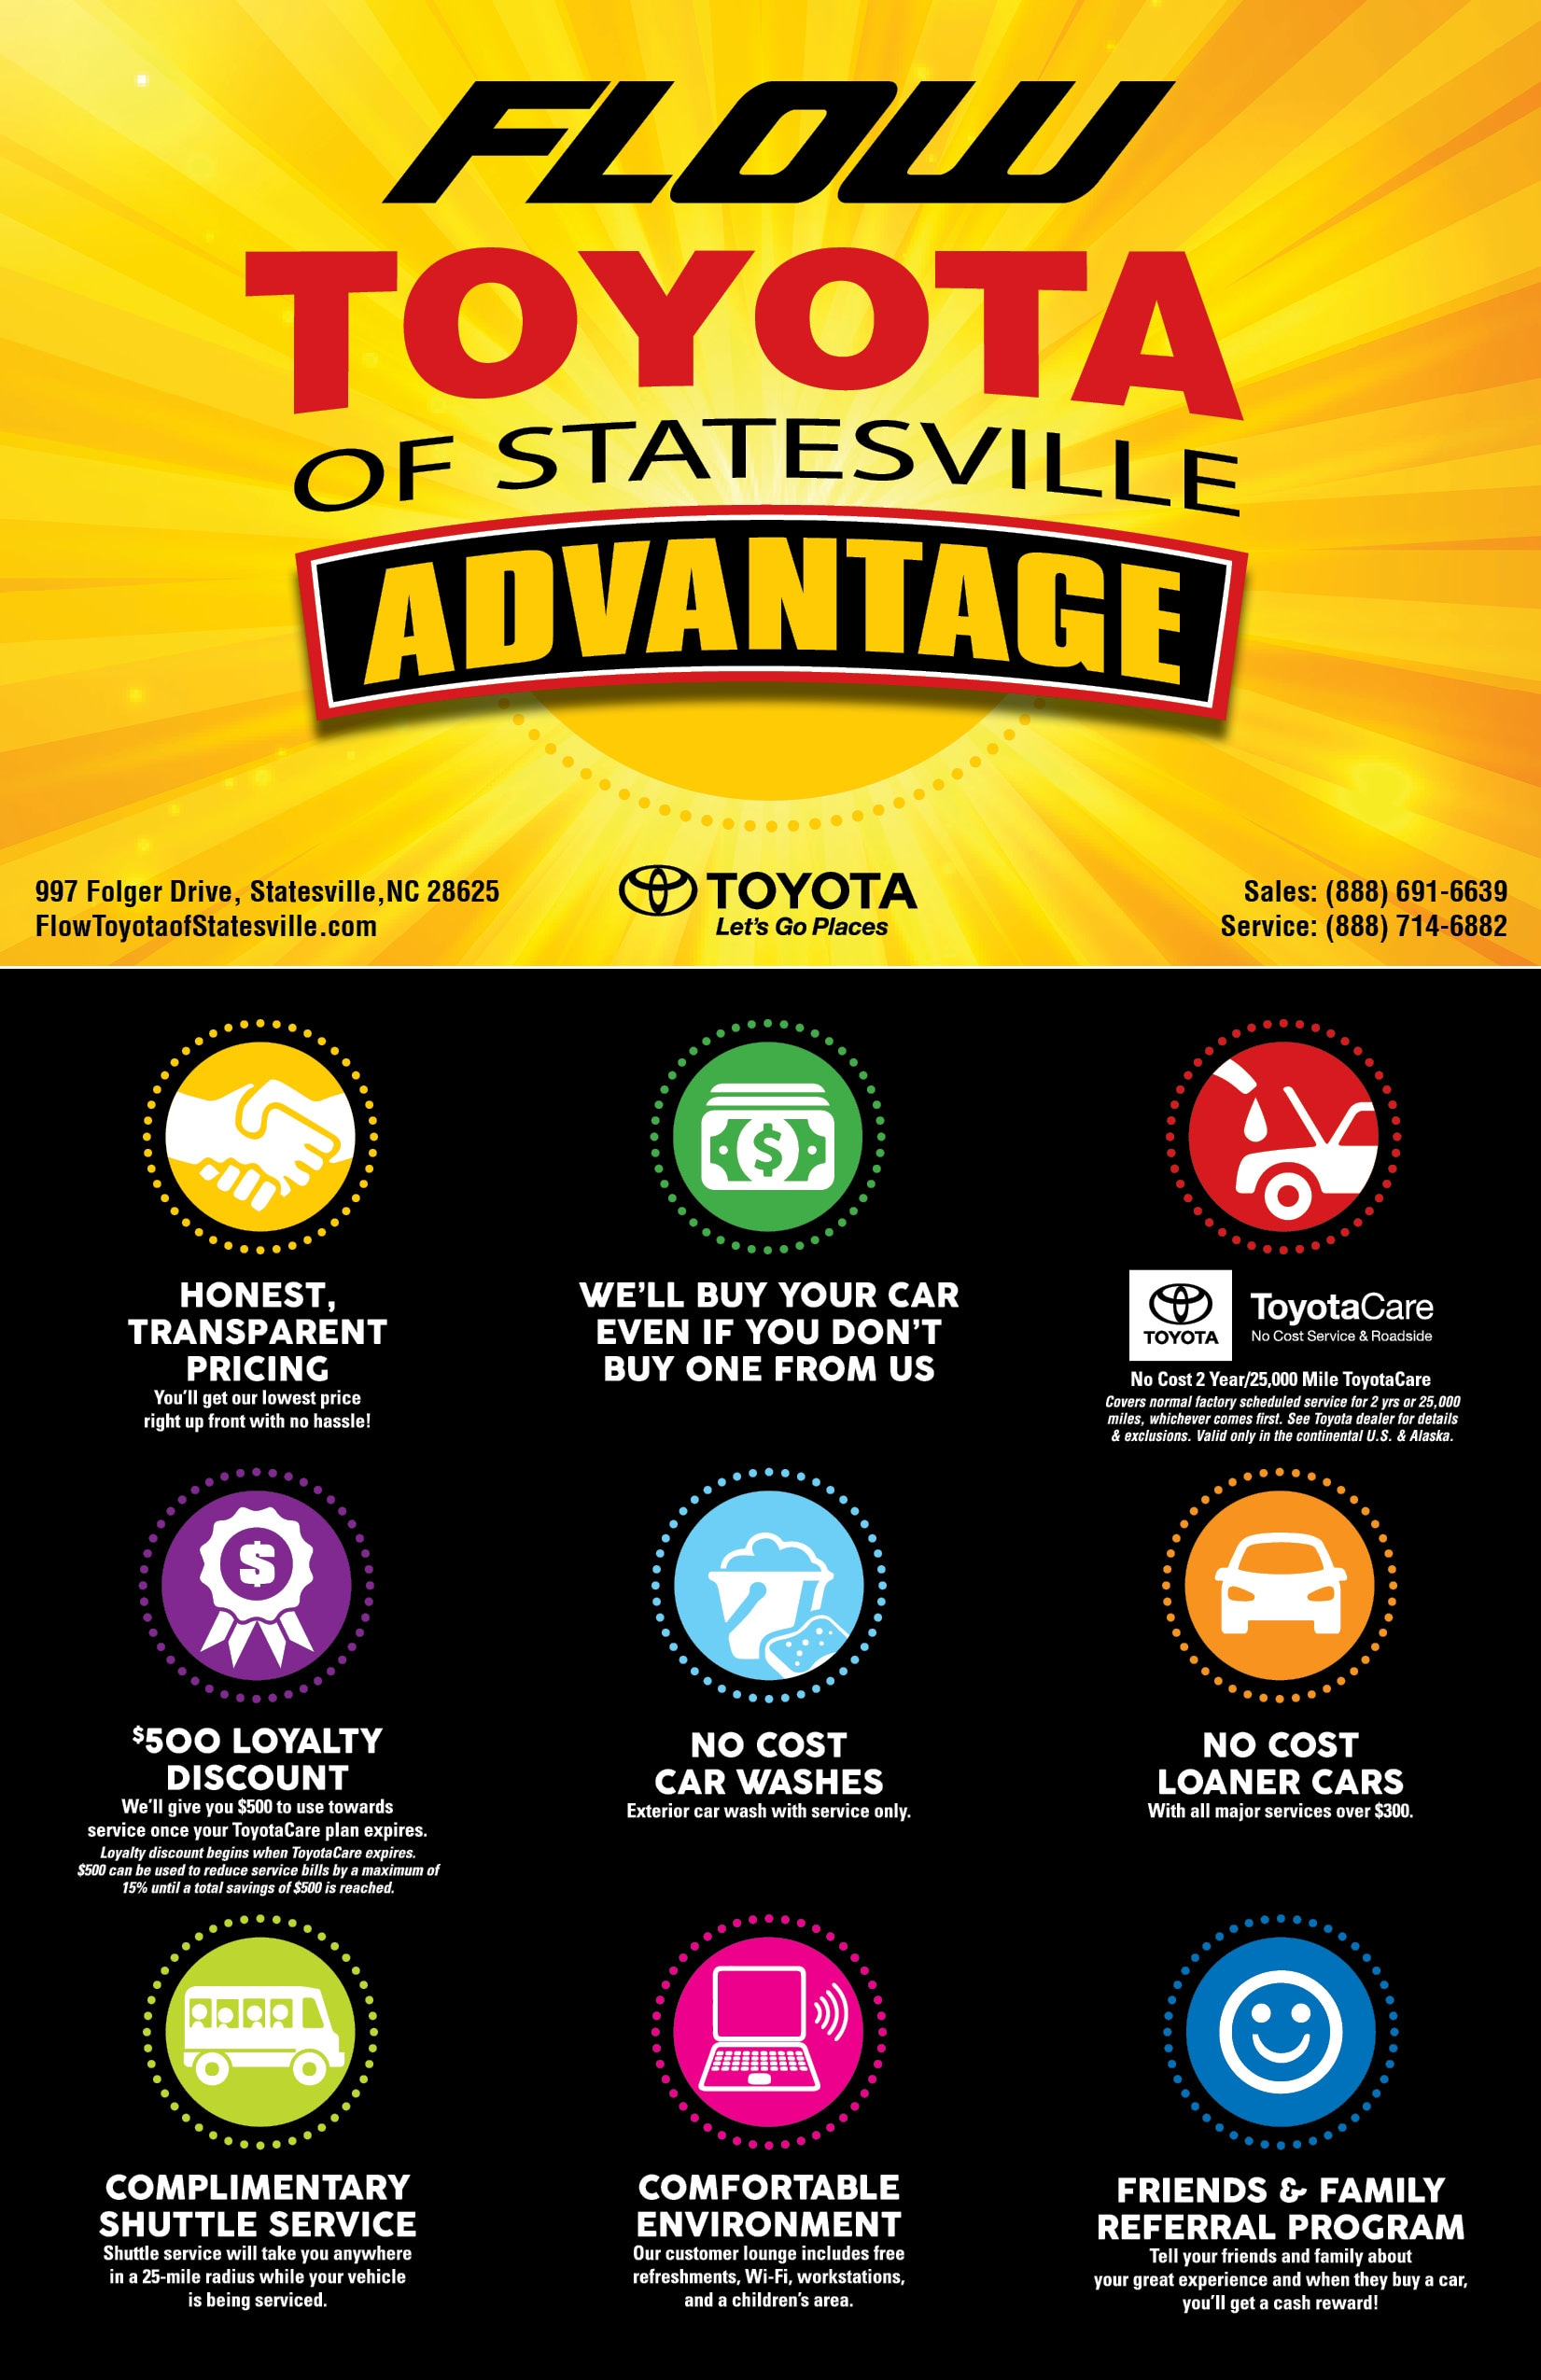 Toyota West Statesville Flow Toyota New Toyota Dealership In Statesville Nc 28625